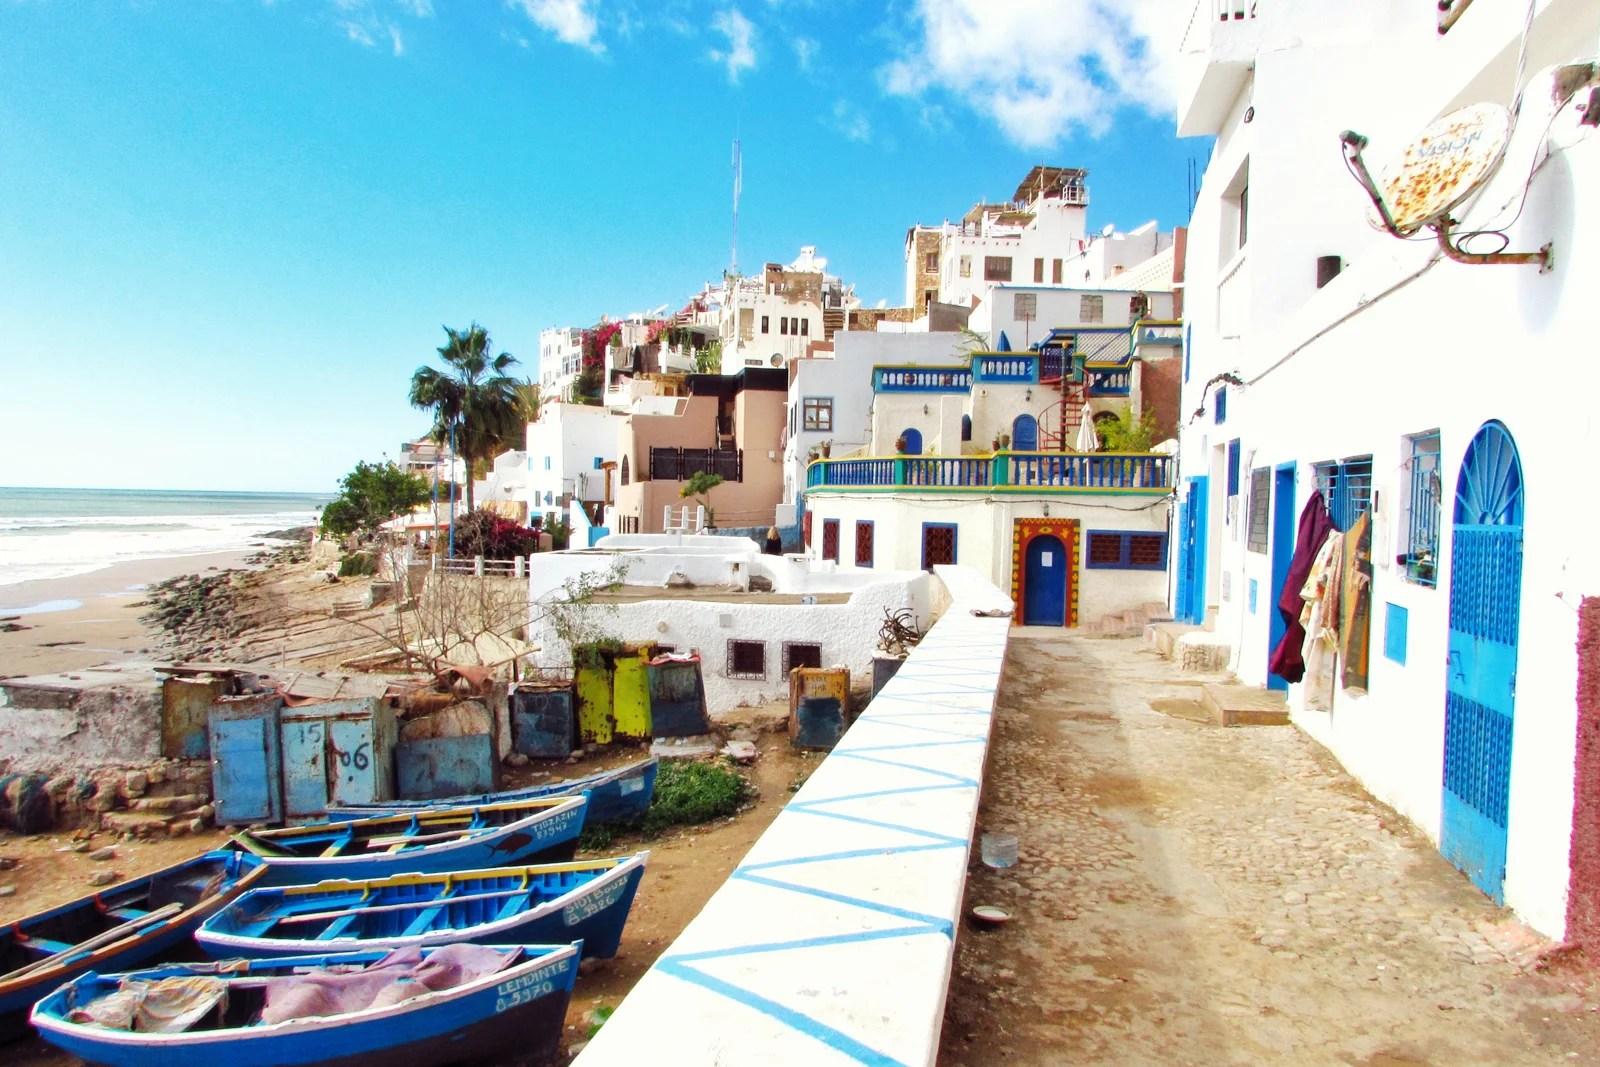 9 mistakes travelers often make in Morocco